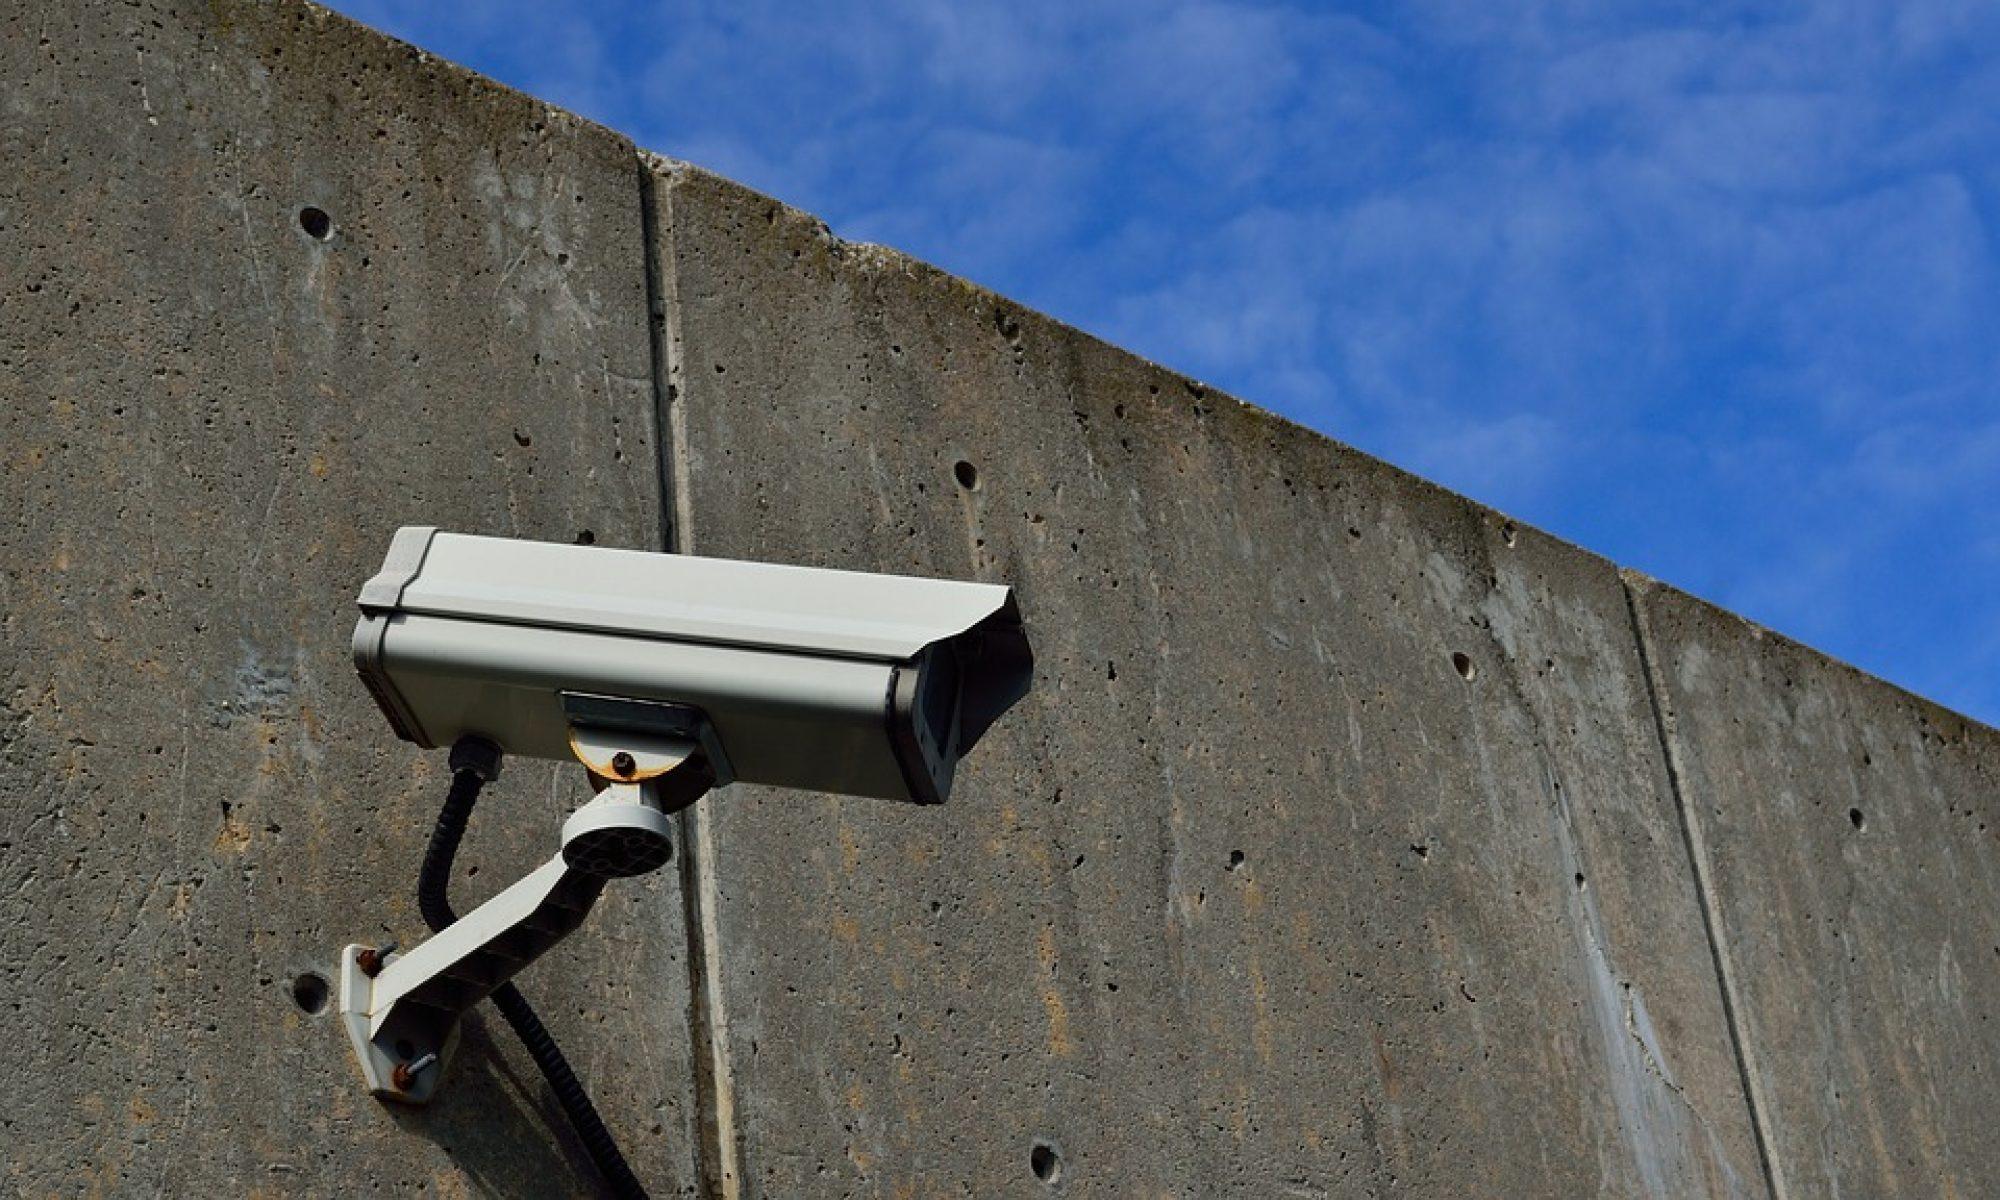 4G CCTV